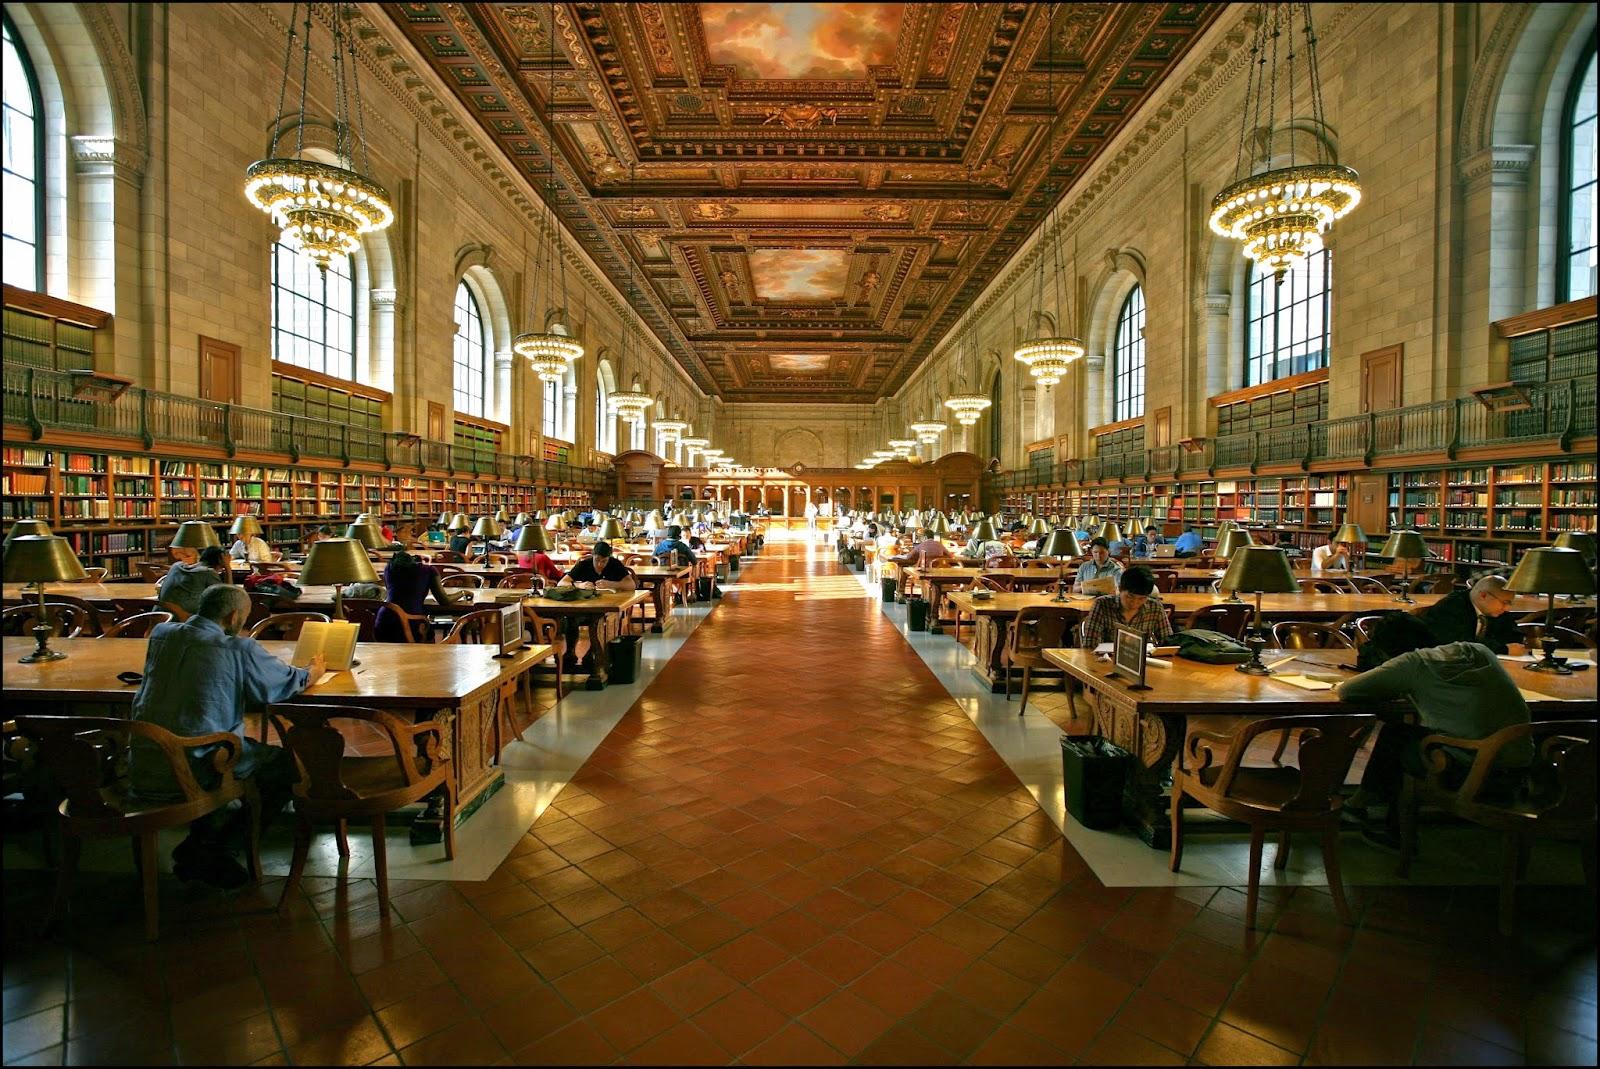 La boda Biblioteca Nyc